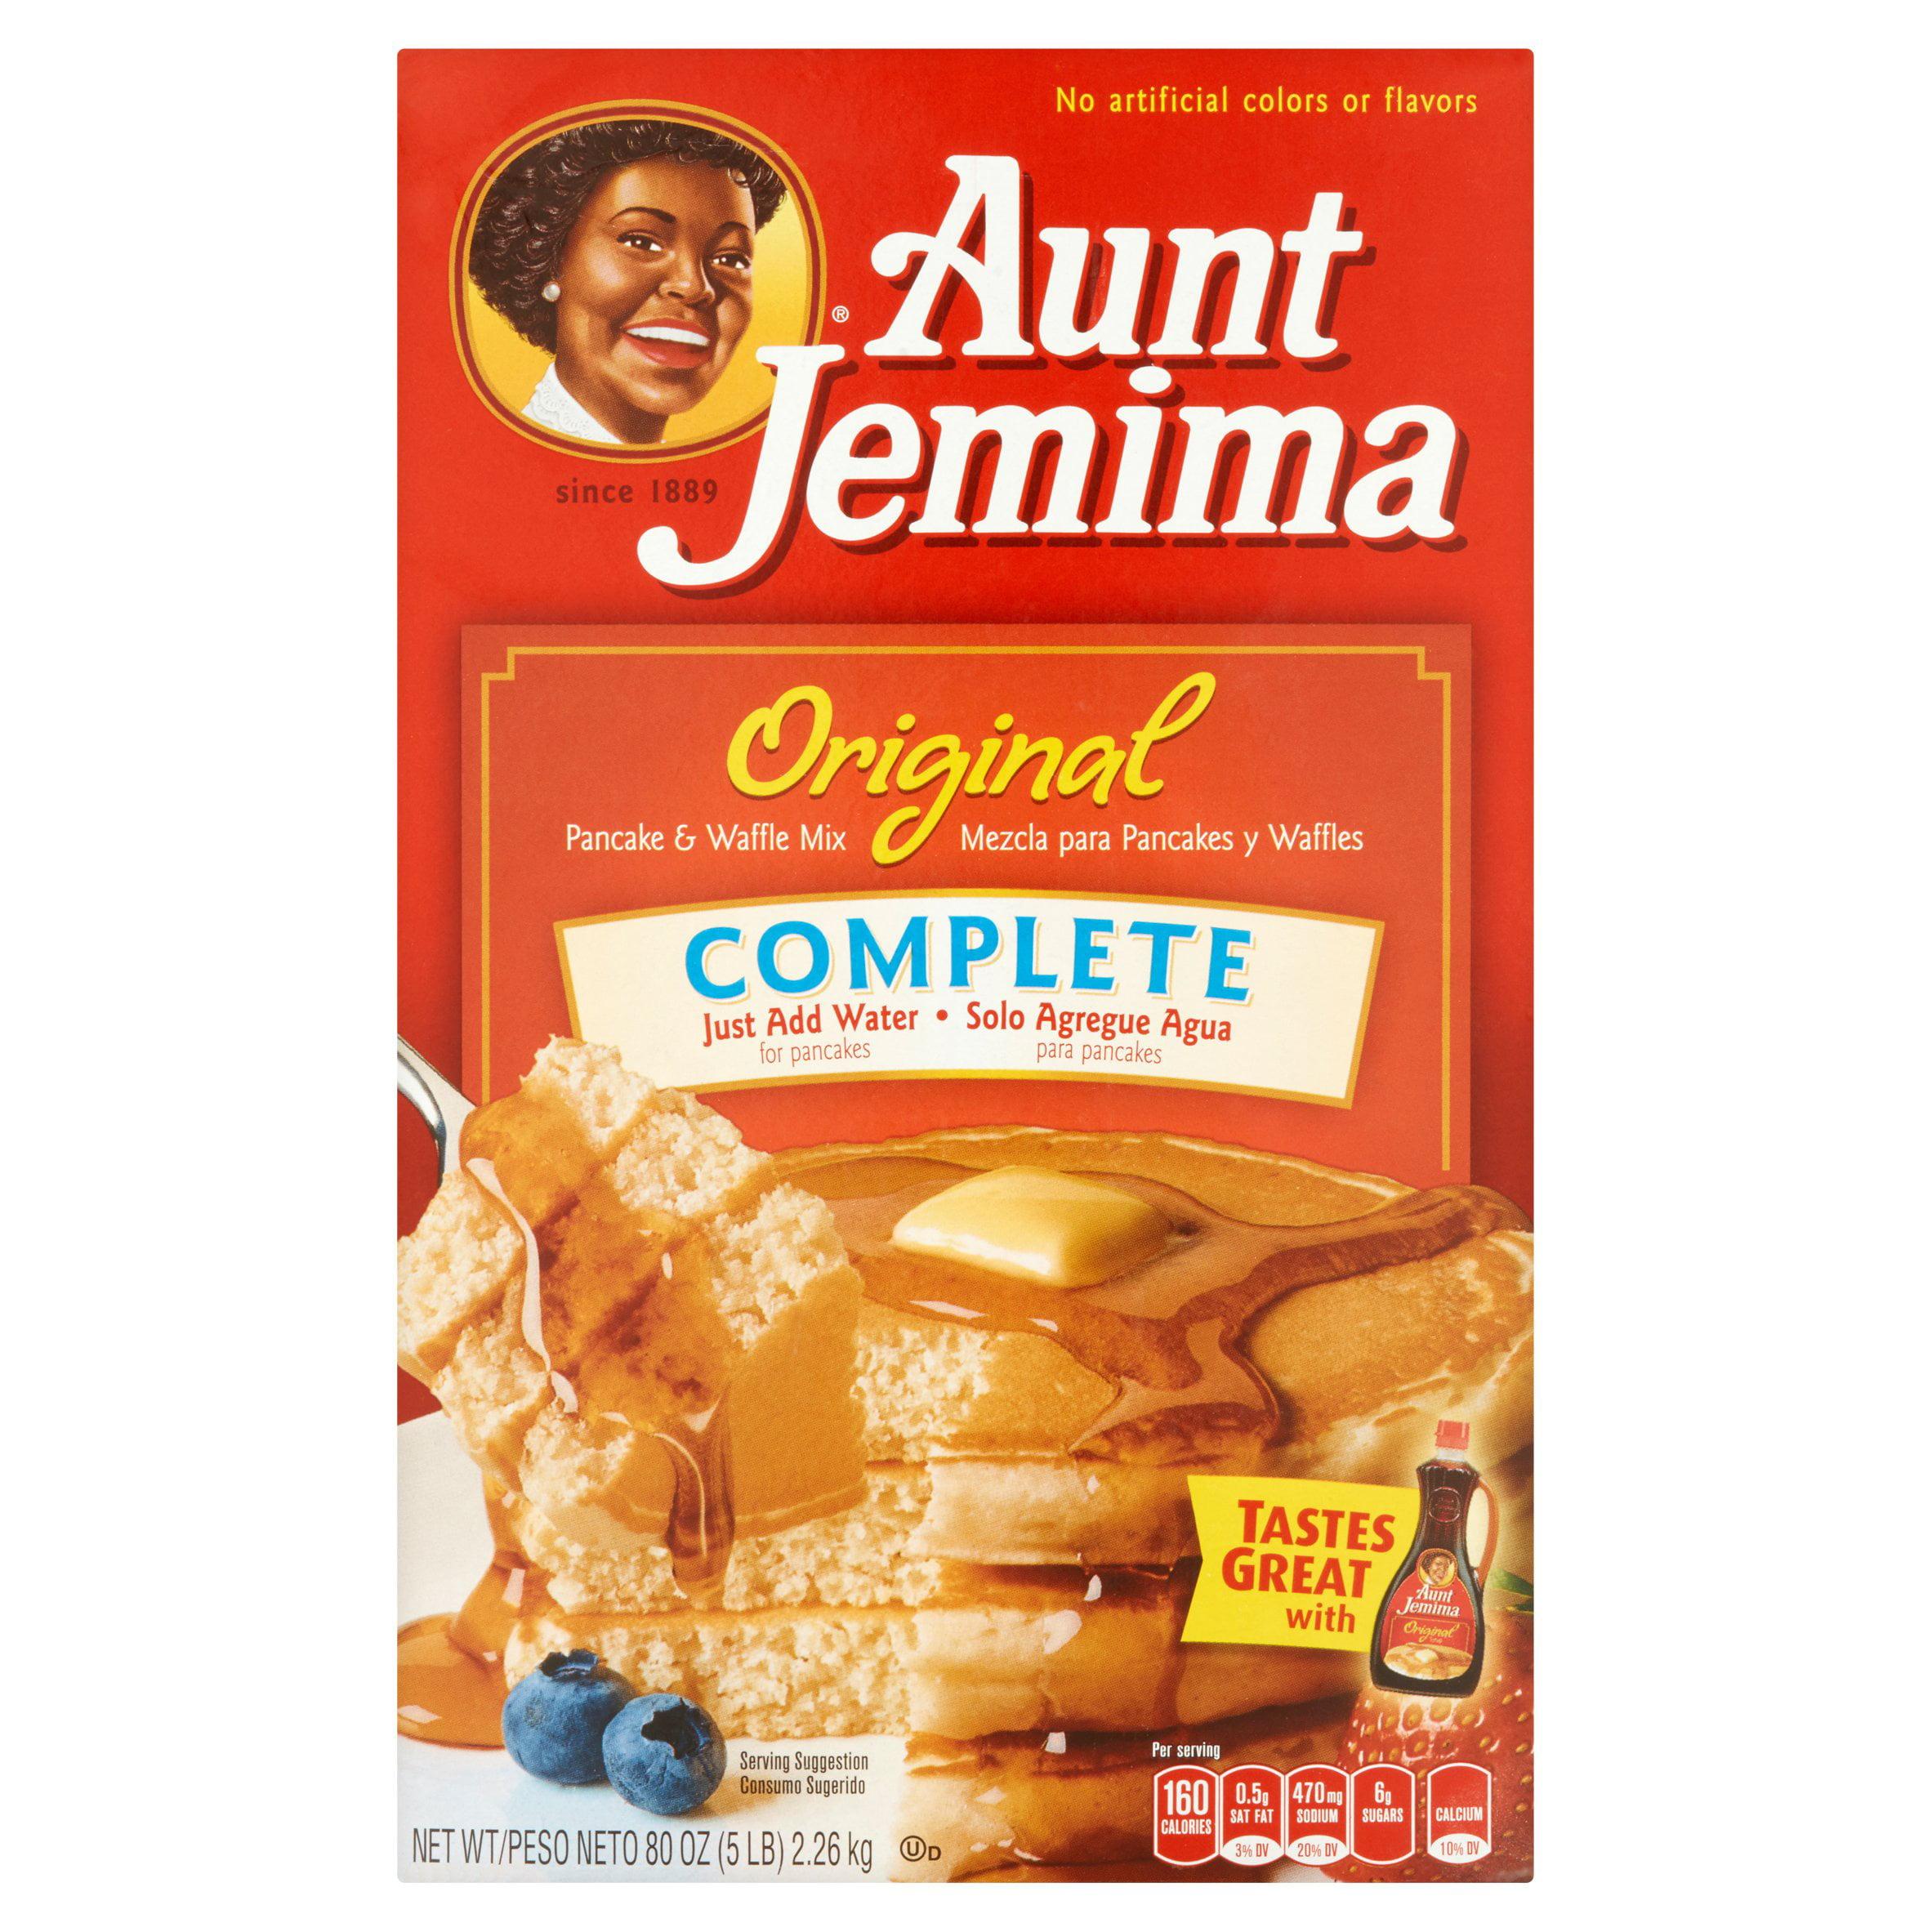 Aunt Jemima Original Complete Pancake & Waffle Mix, 80 oz by The Quaker Oats Company